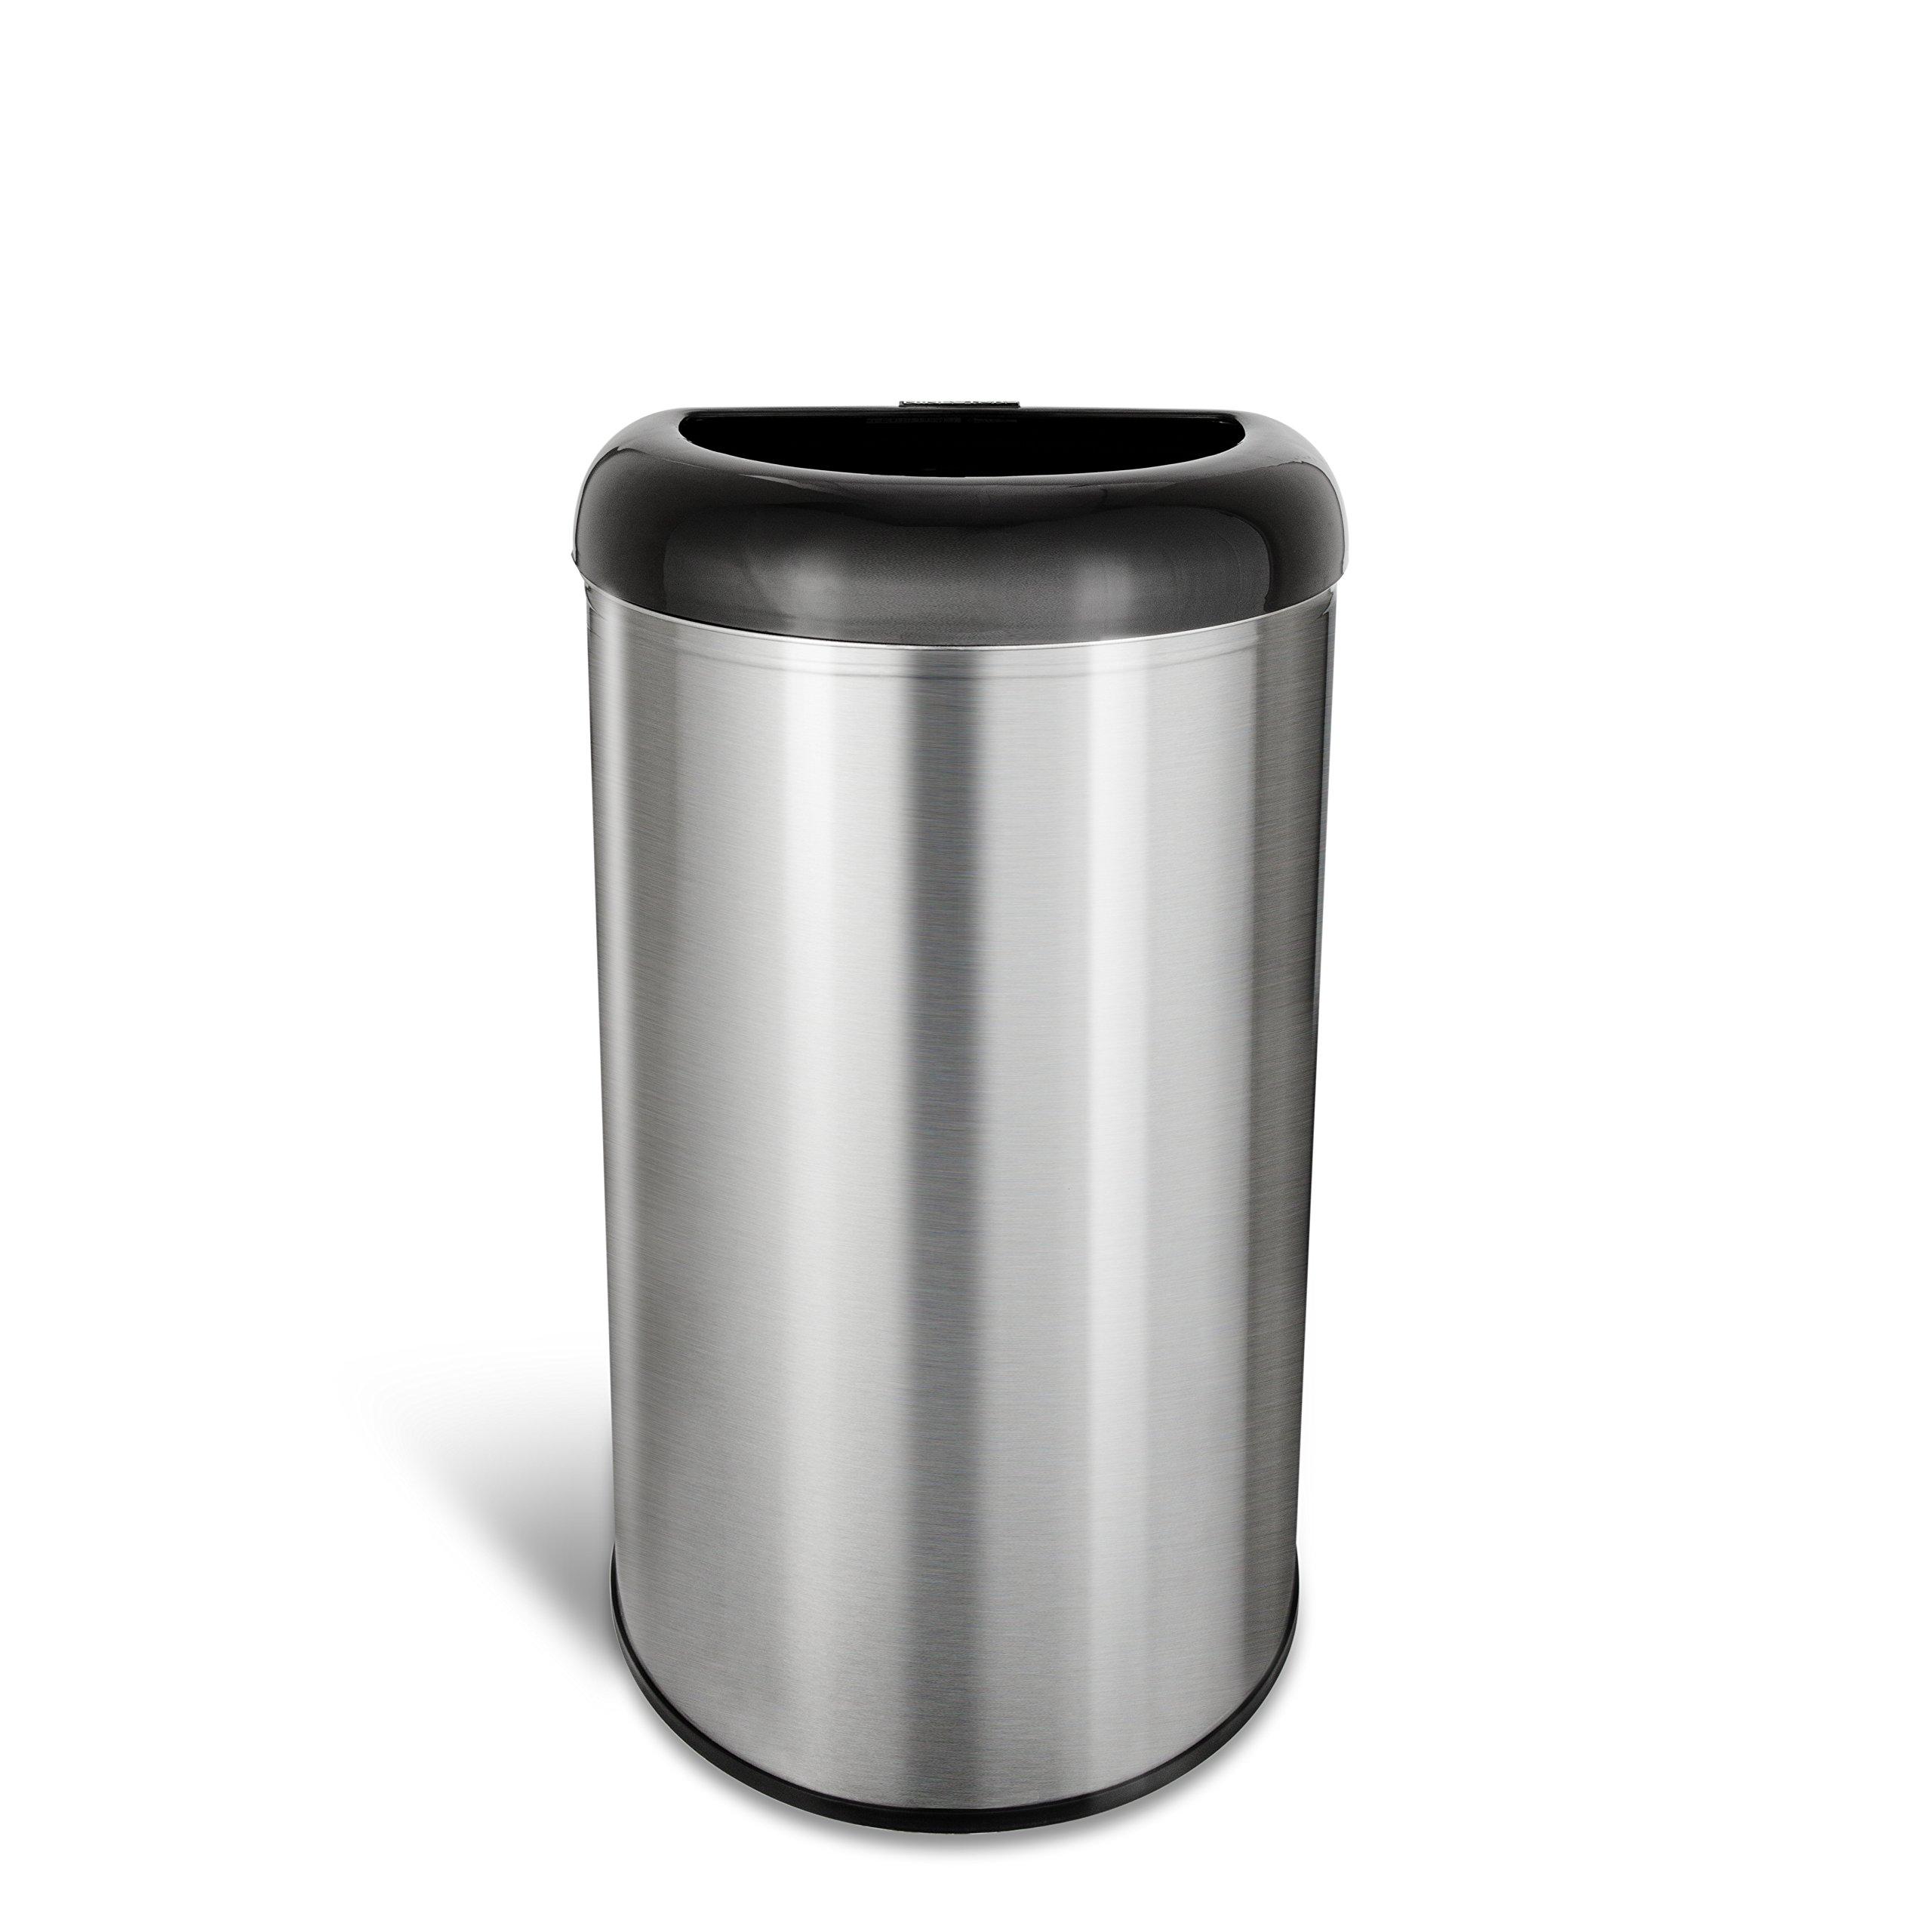 Ninestars OTT-50-19BK Open Top Office Bathroom Trash Can, 13 Gal 50L, Stainless Steel Base (D Shape, Black Lid)